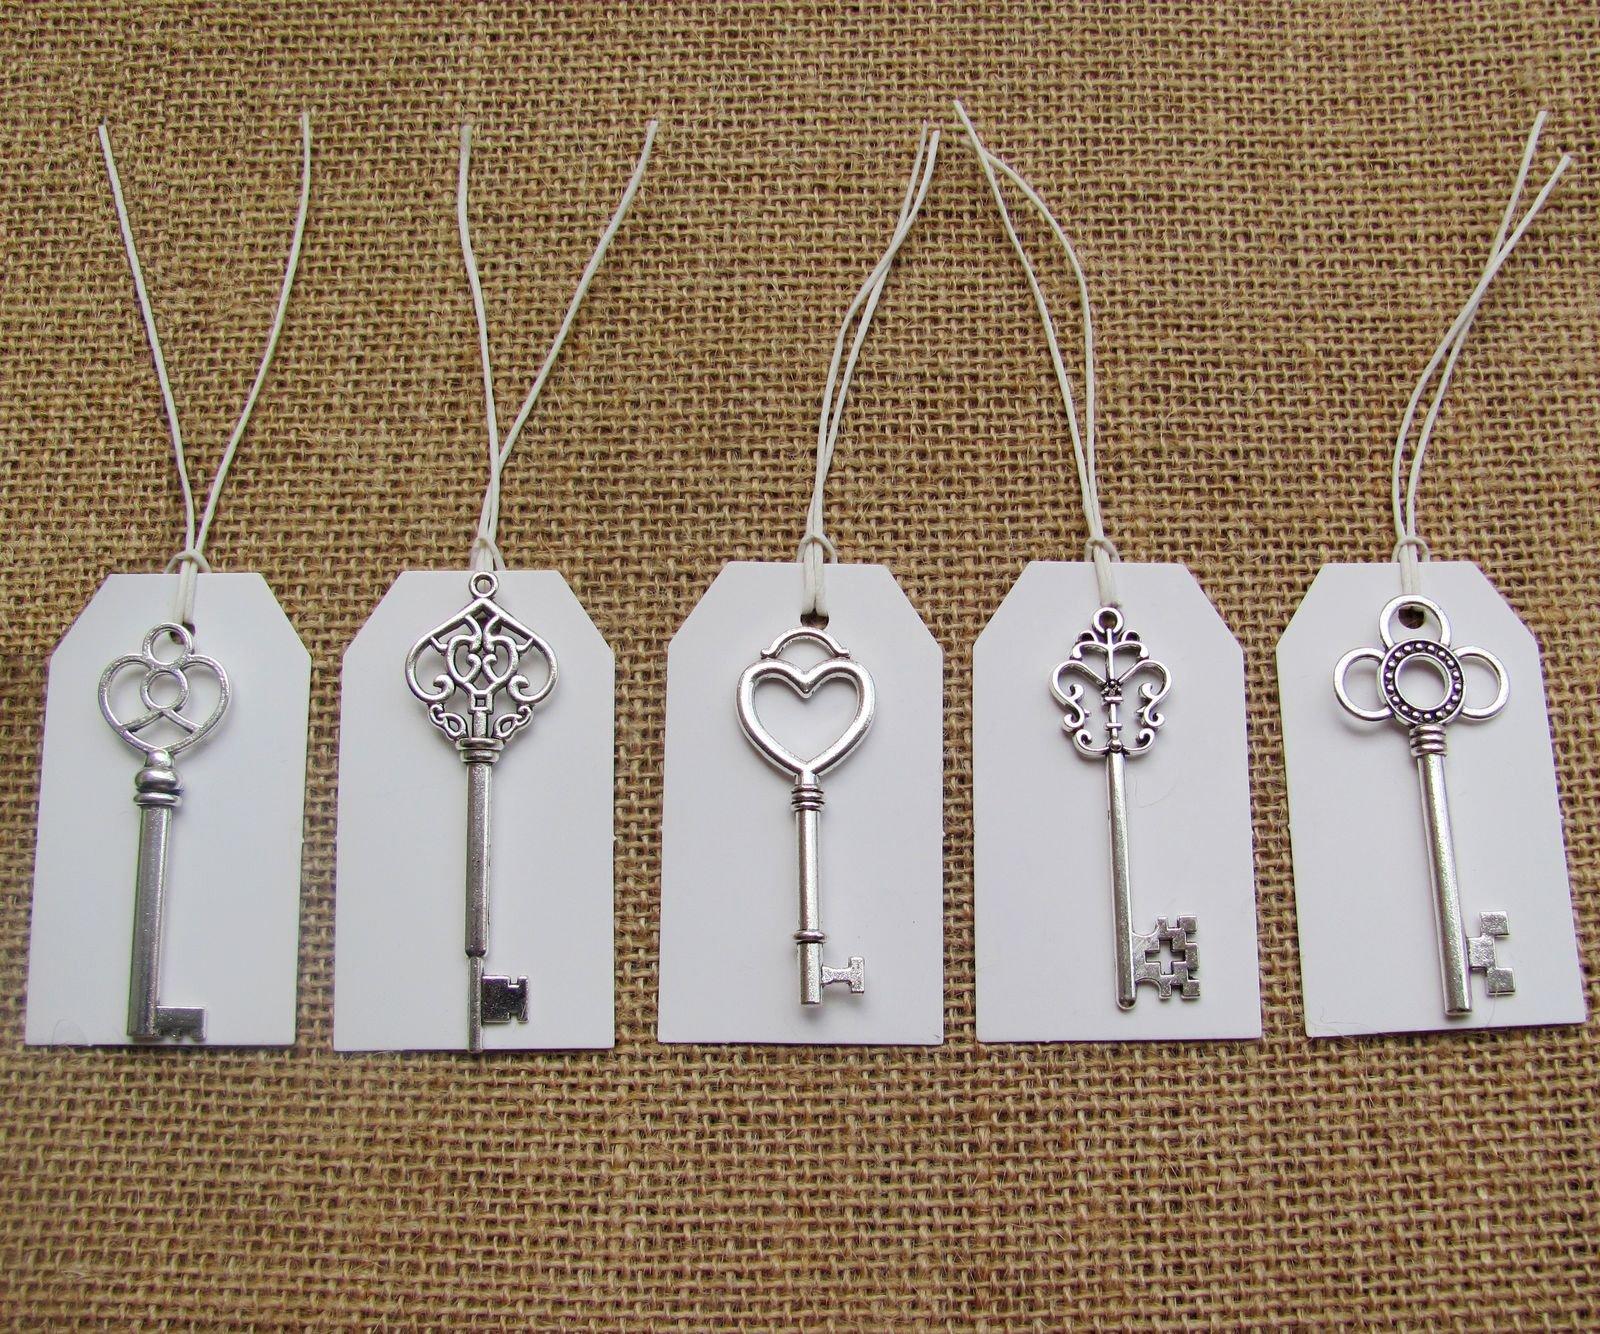 SL crafts Mixed 100pcs Antique Silver Skeleton Keys & 100 pcs White Tags Key Charms Pendants Wedding favor 53mm-68mm by SL crafts (Image #2)